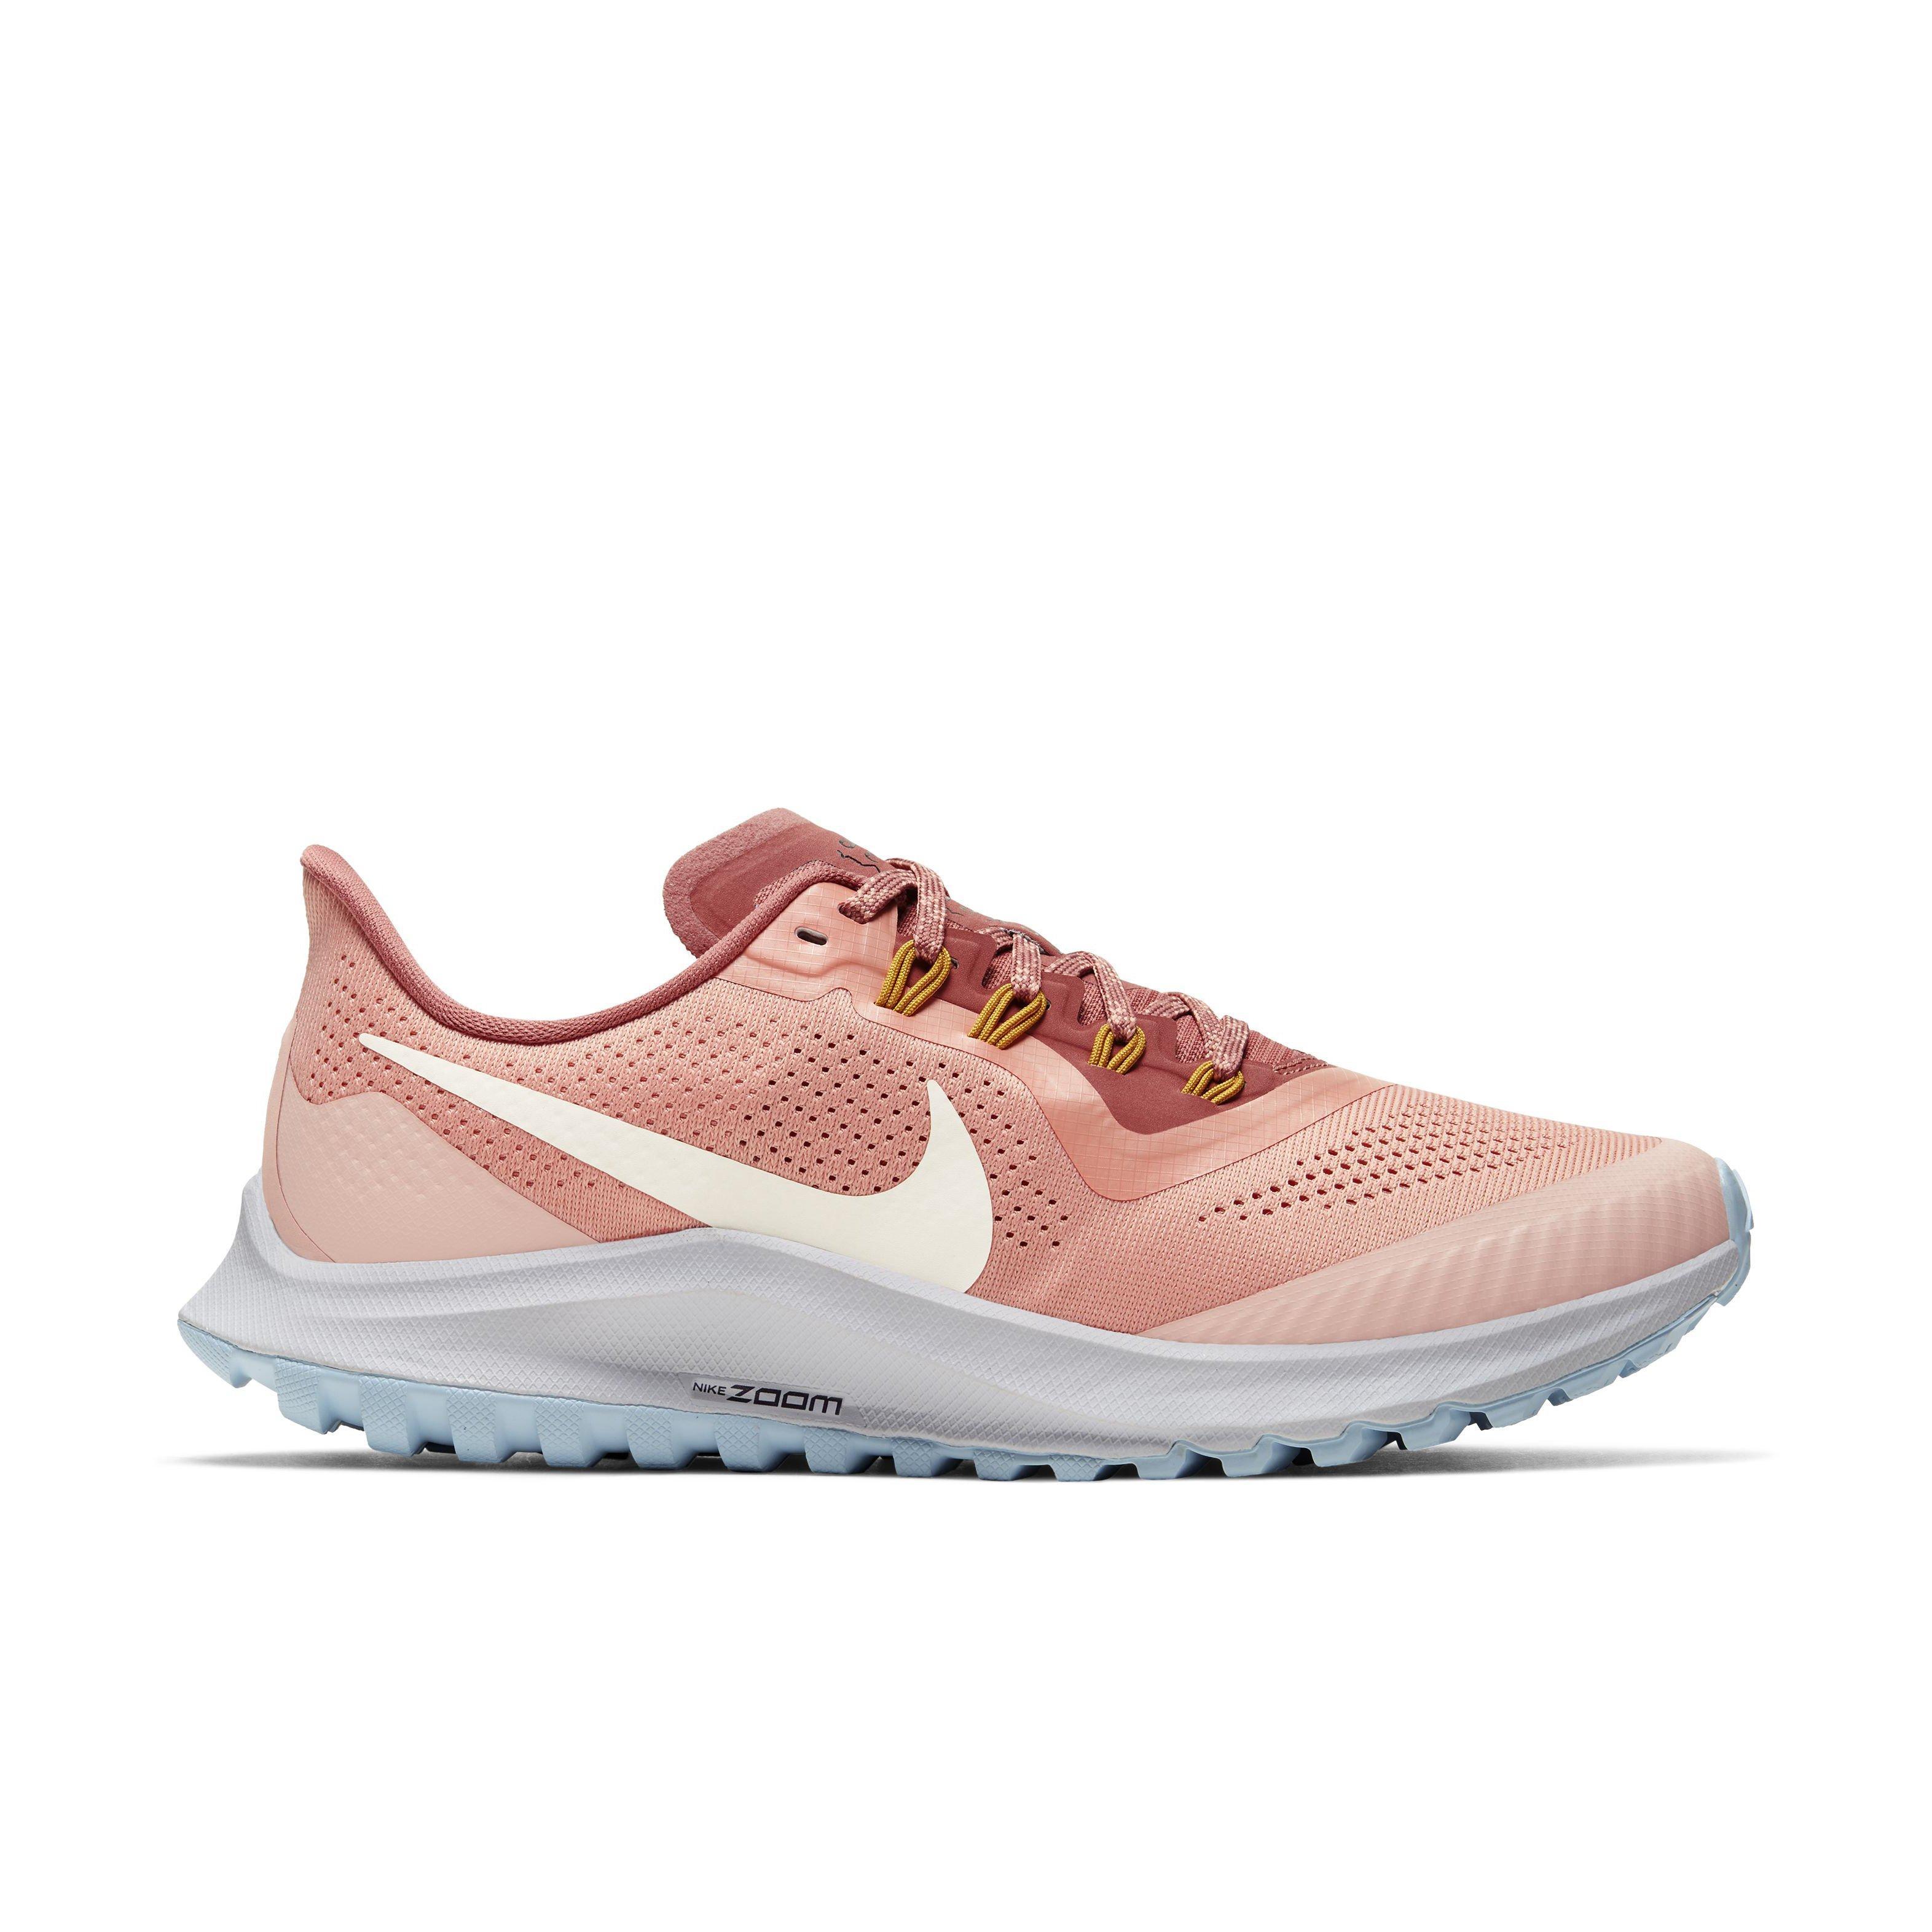 Más cinta Atar  Nike Air Zoom Pegasus 36 Trail Pink